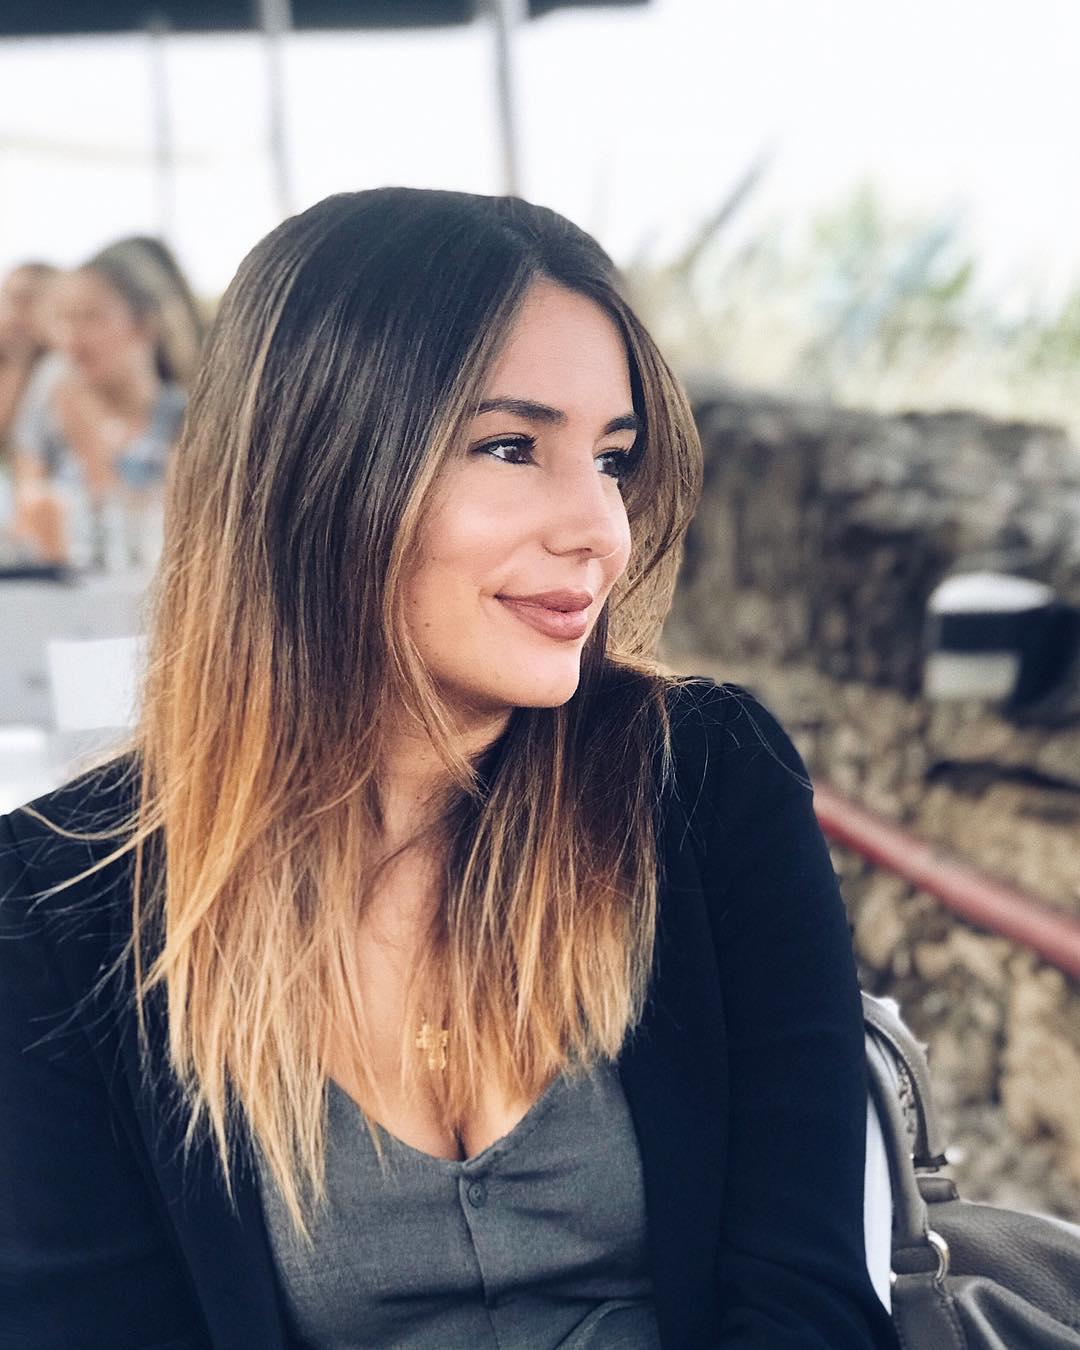 Mia Rose 3 Mia Rosa Exibe Corpo De Sonho Cinco Meses Após Ter Sido Mãe